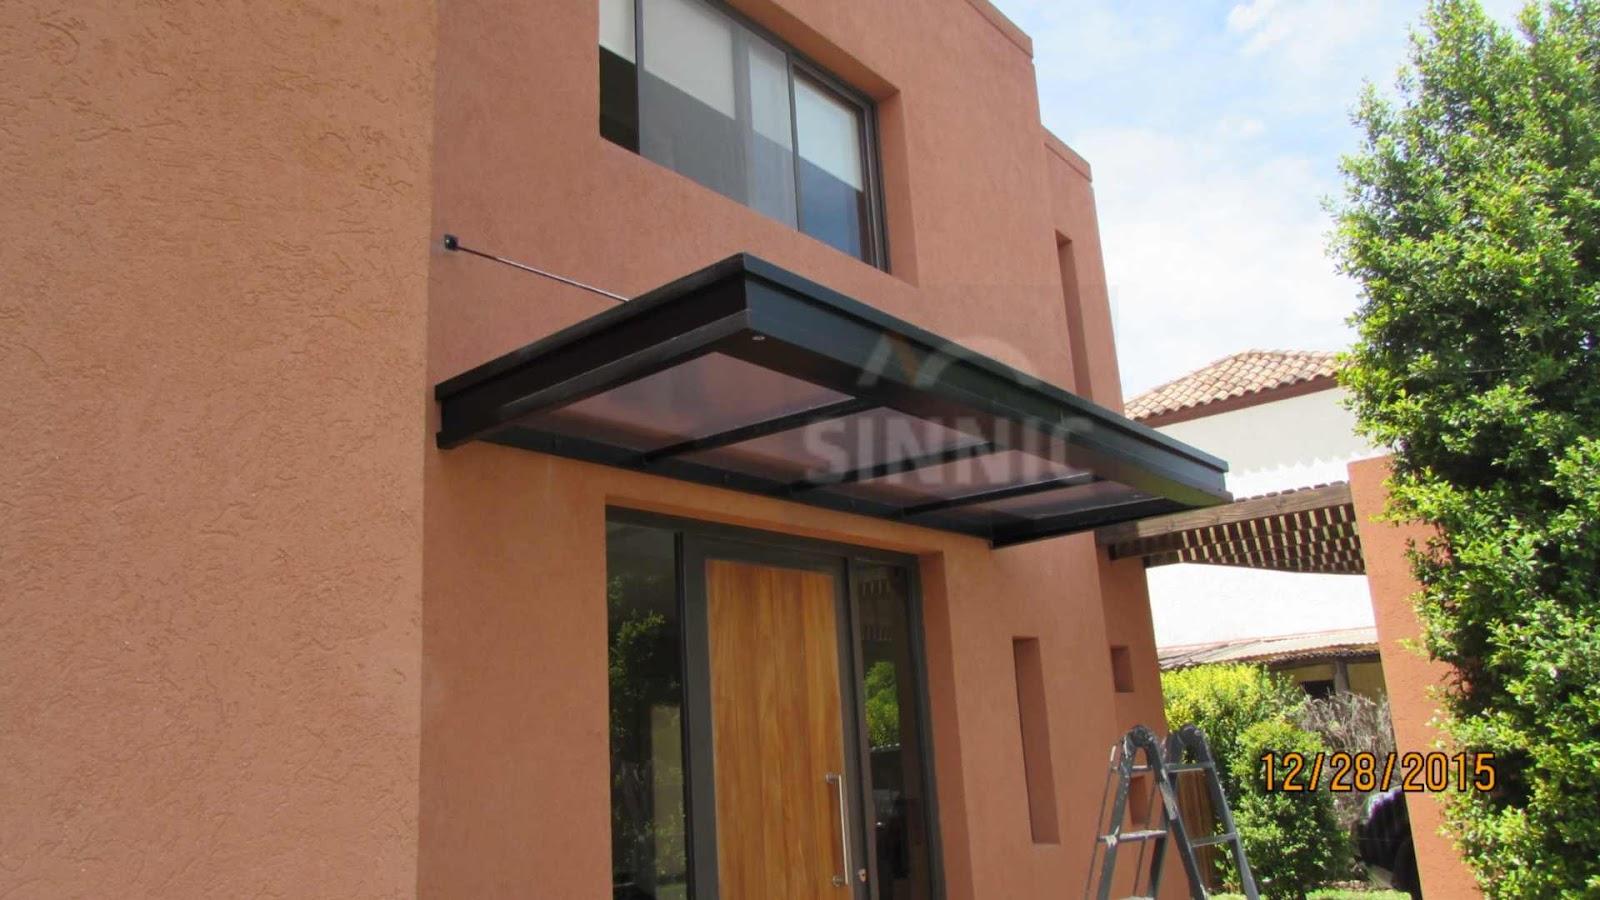 Alero para puertas o ventanas aleros para puertas o ventanas for Modelos de gibson para techos